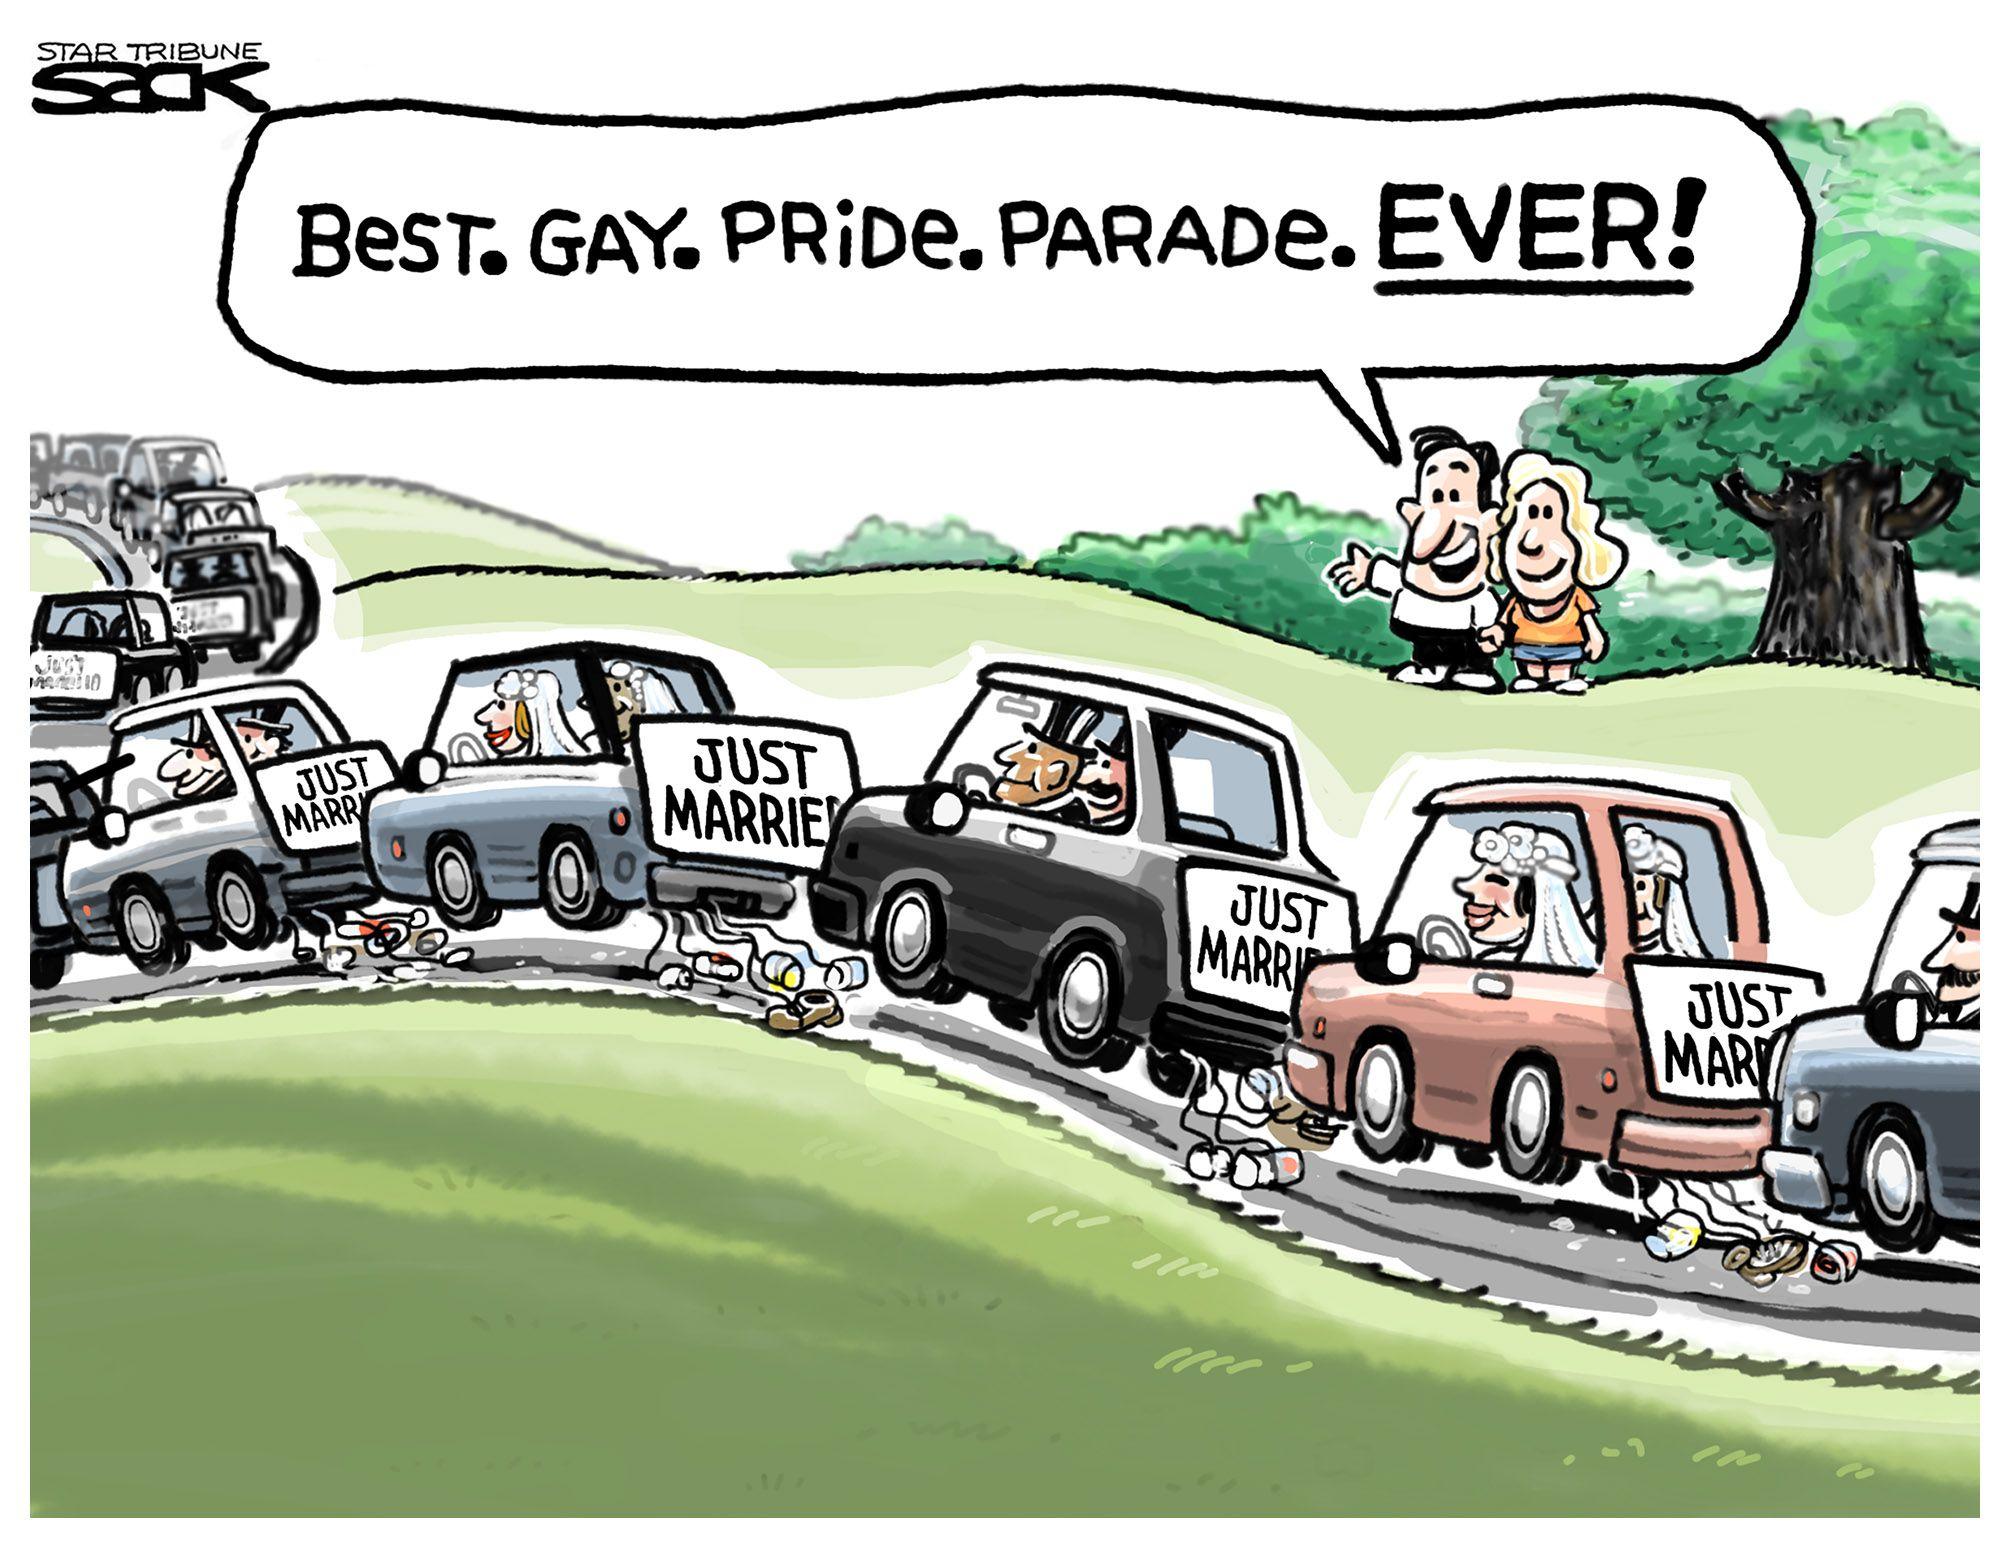 from Enzo gay pride cartoons